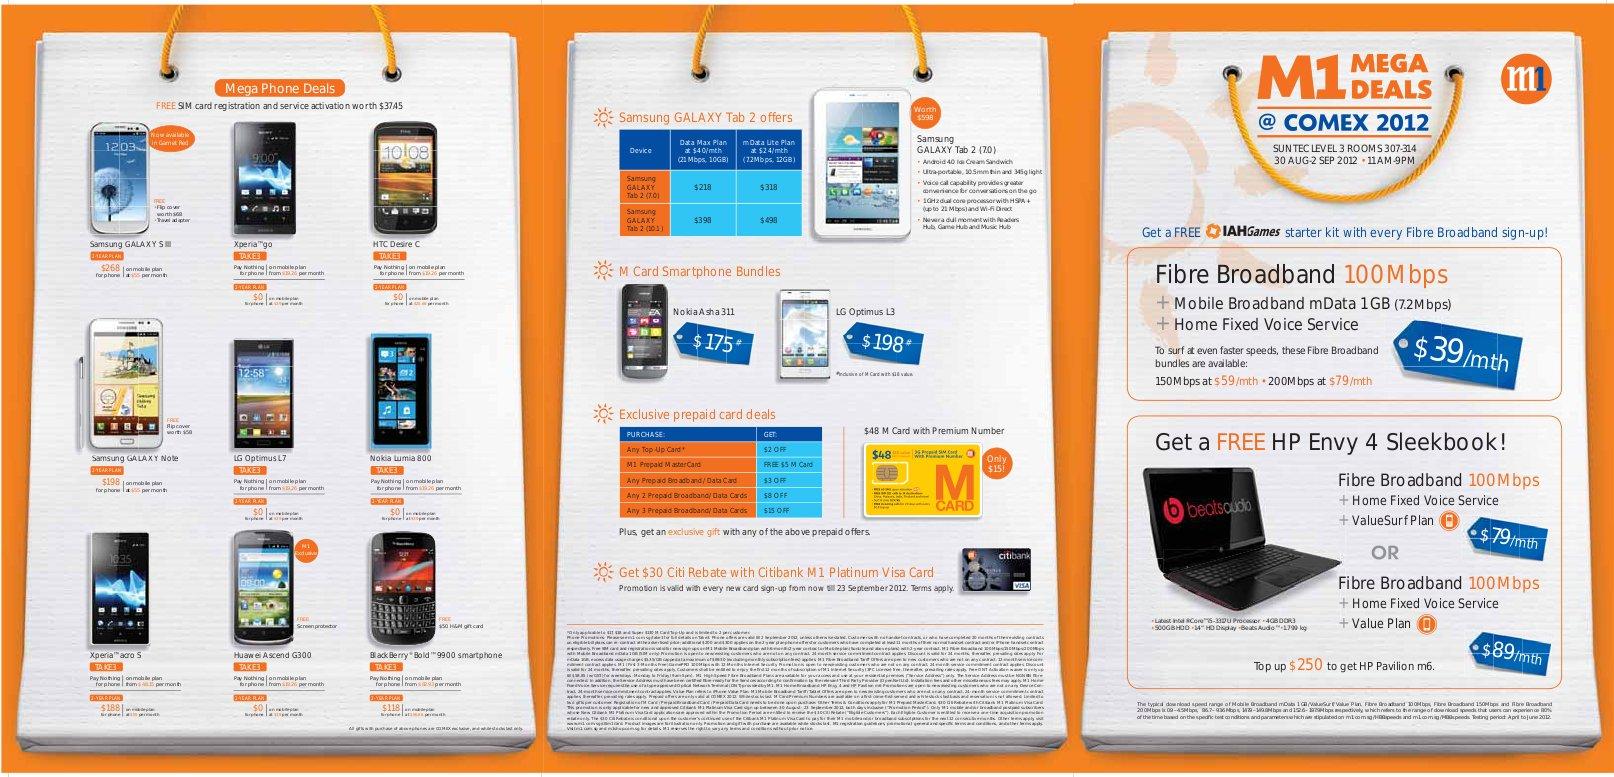 M1 COMEX 2012 Pricelist 1